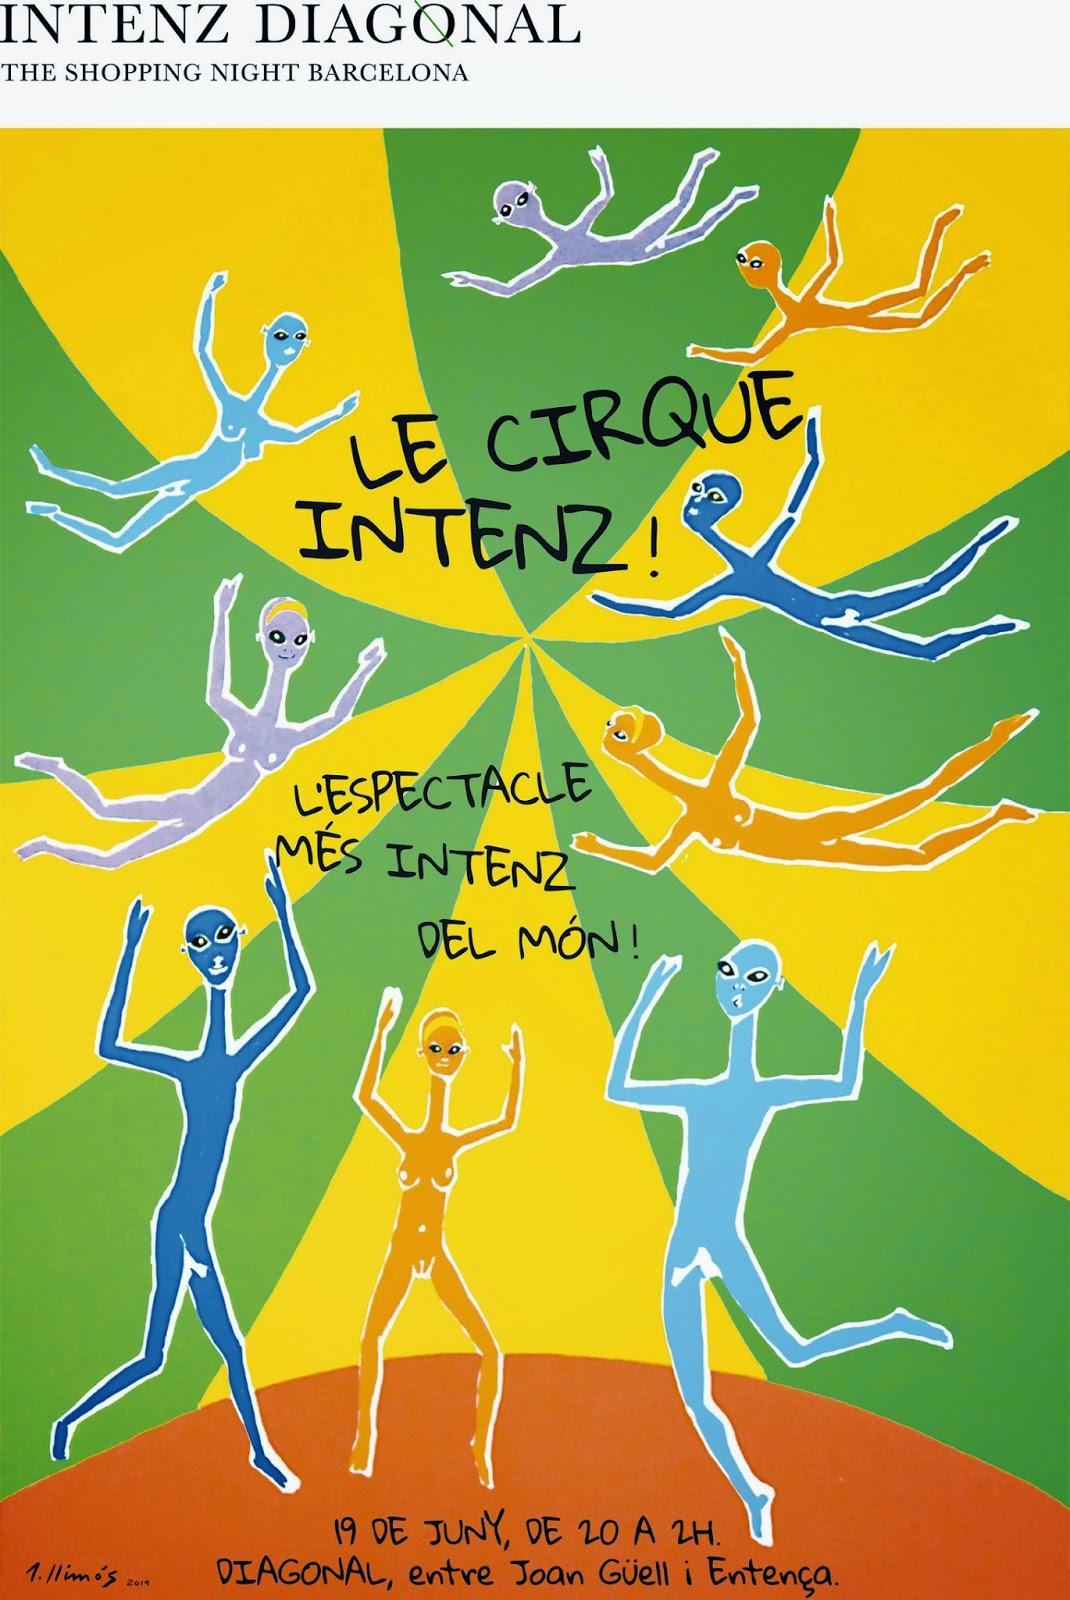 Cartel oficial Intenz Diagonal by TSNB